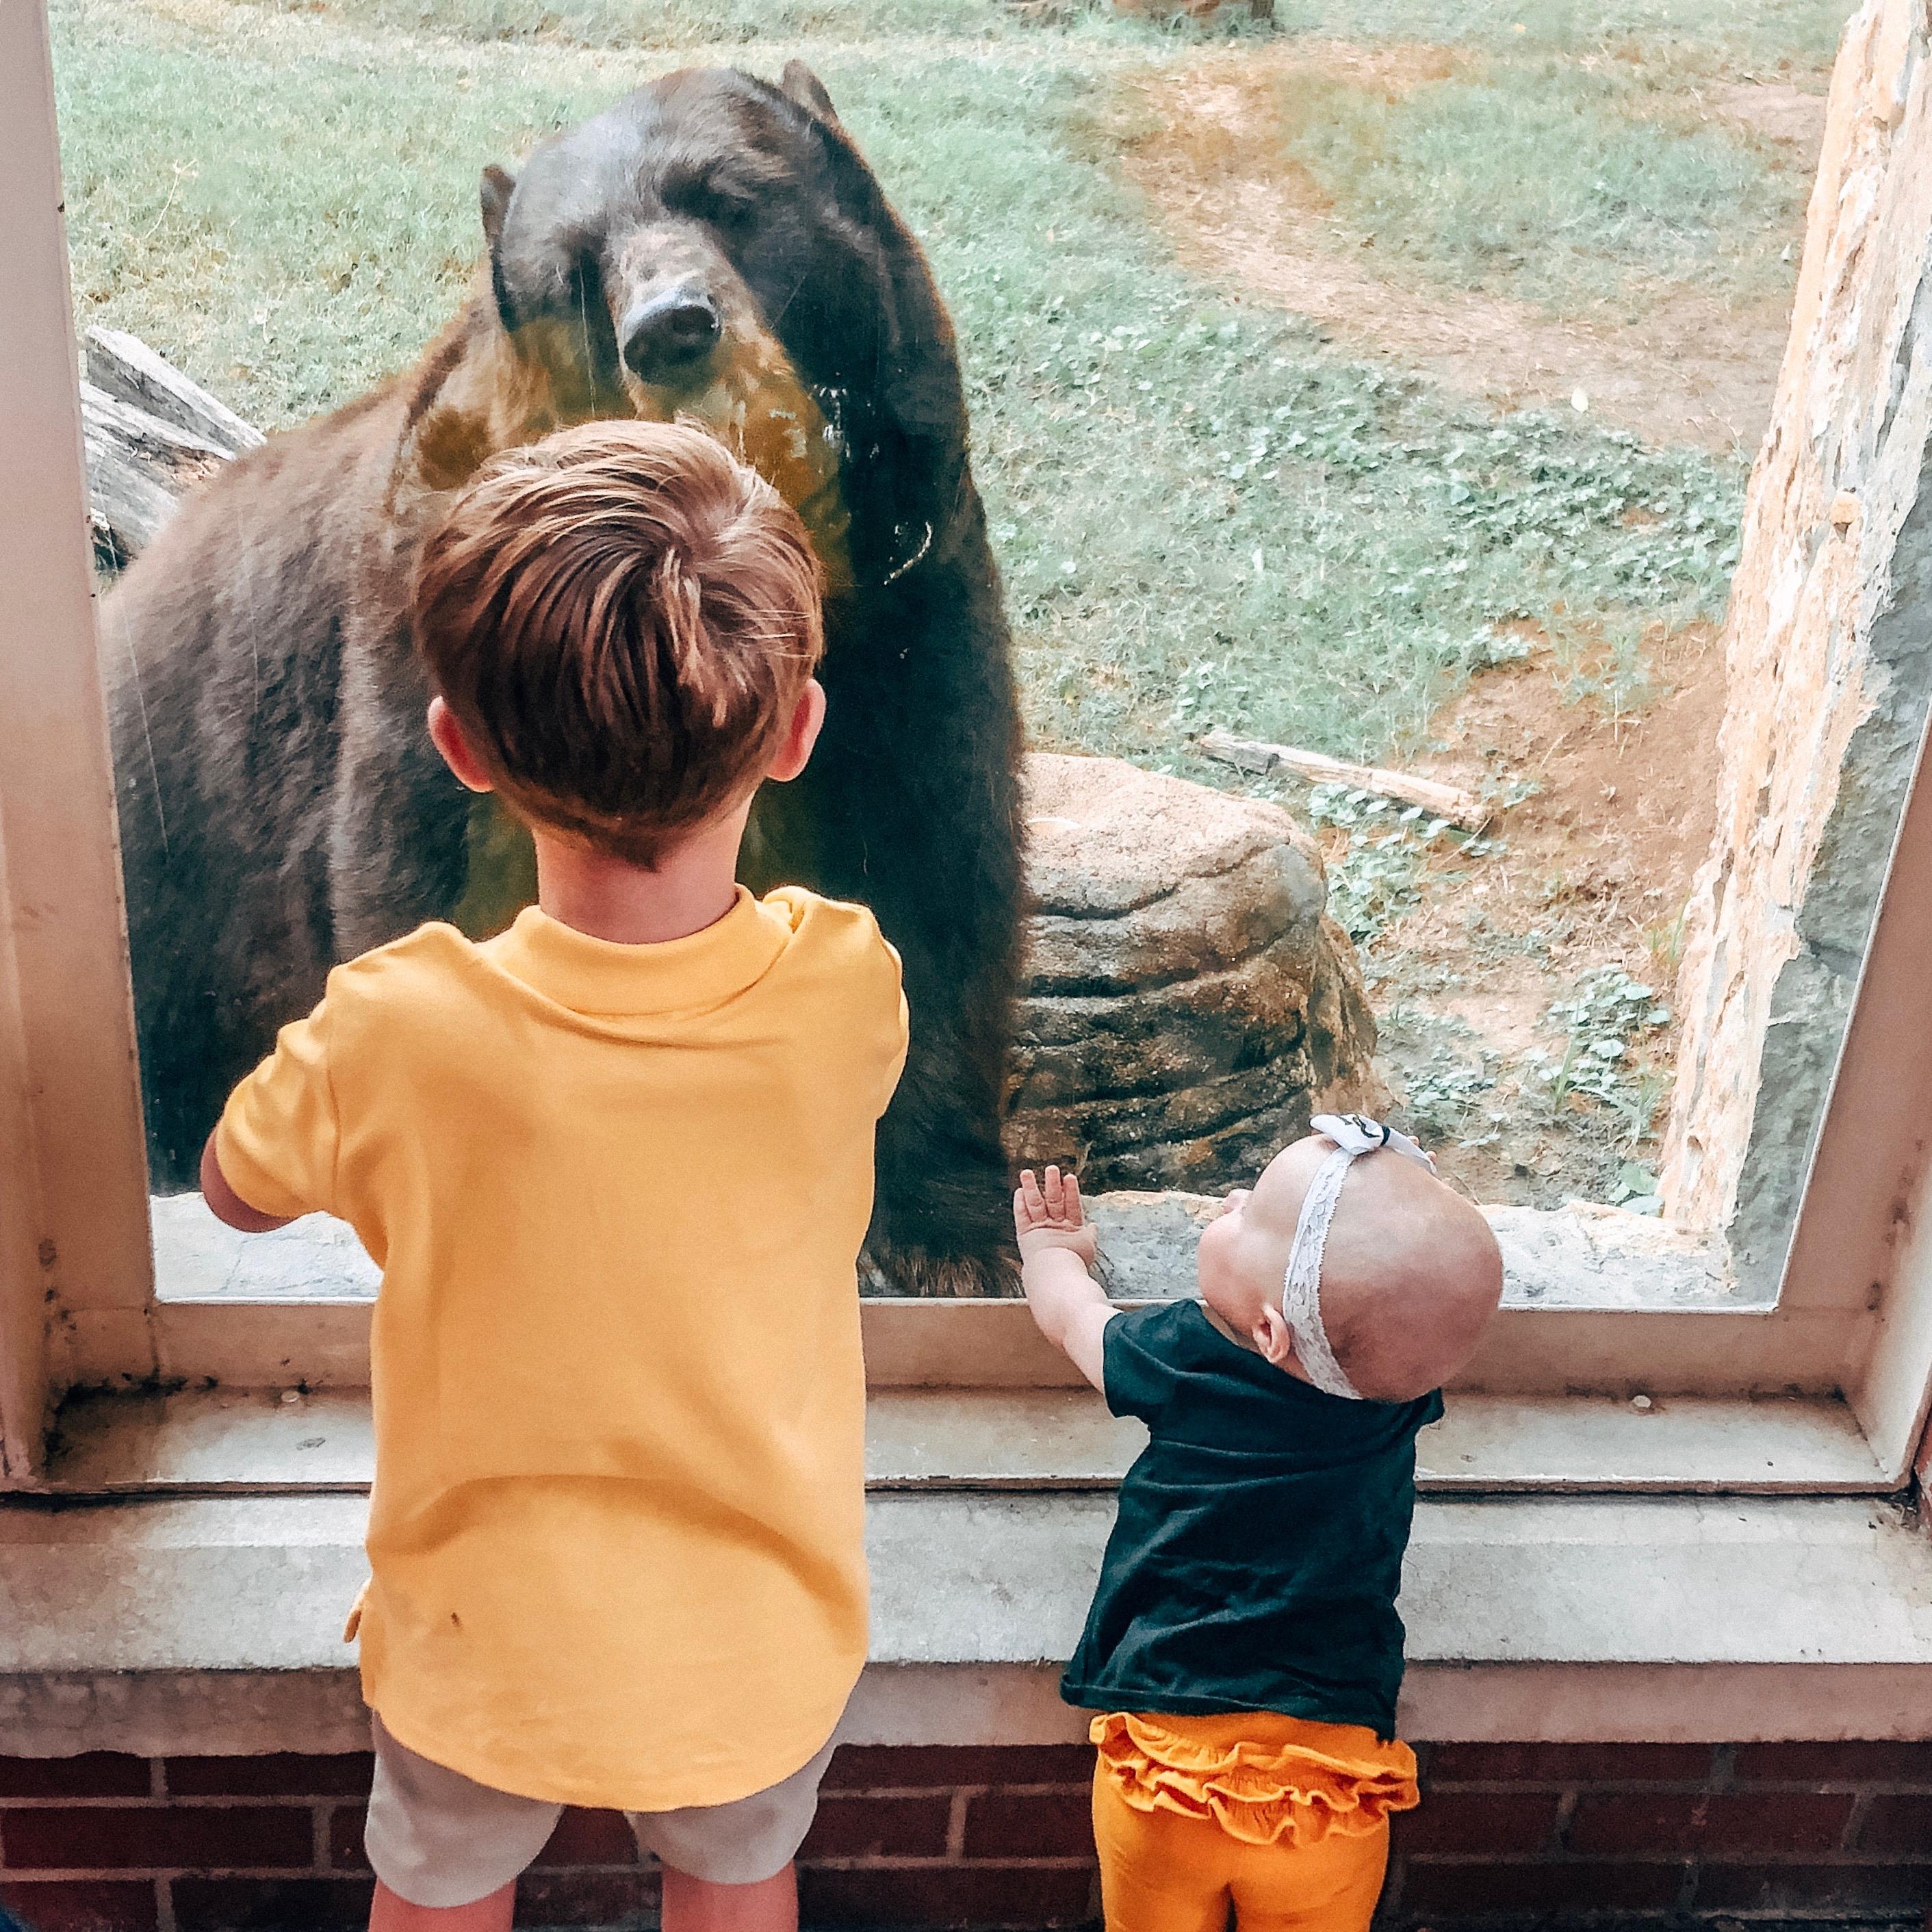 Photo of bears in their habitat